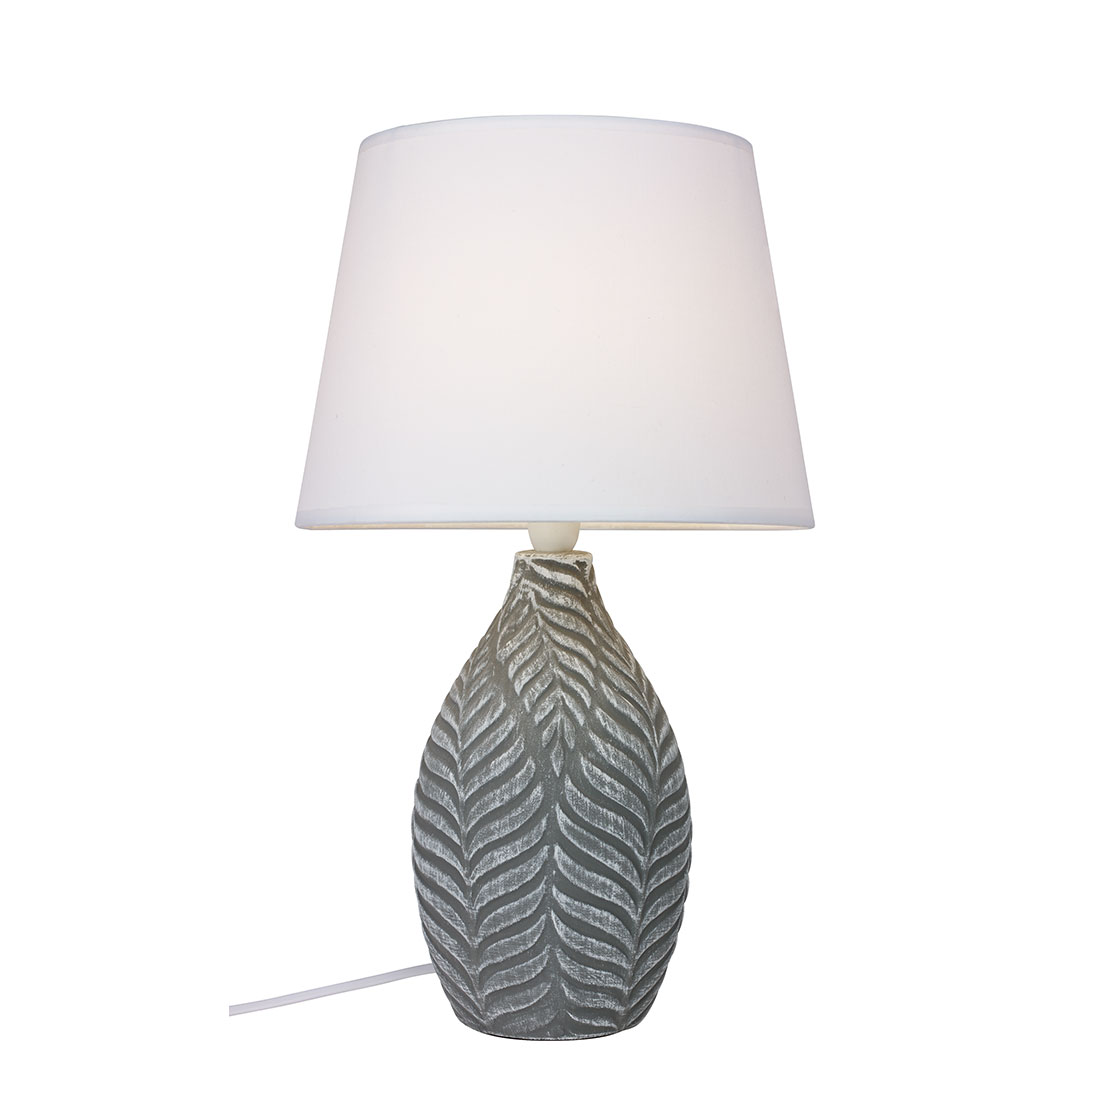 Bordslampor Köp bordslampa online   Lampan.se